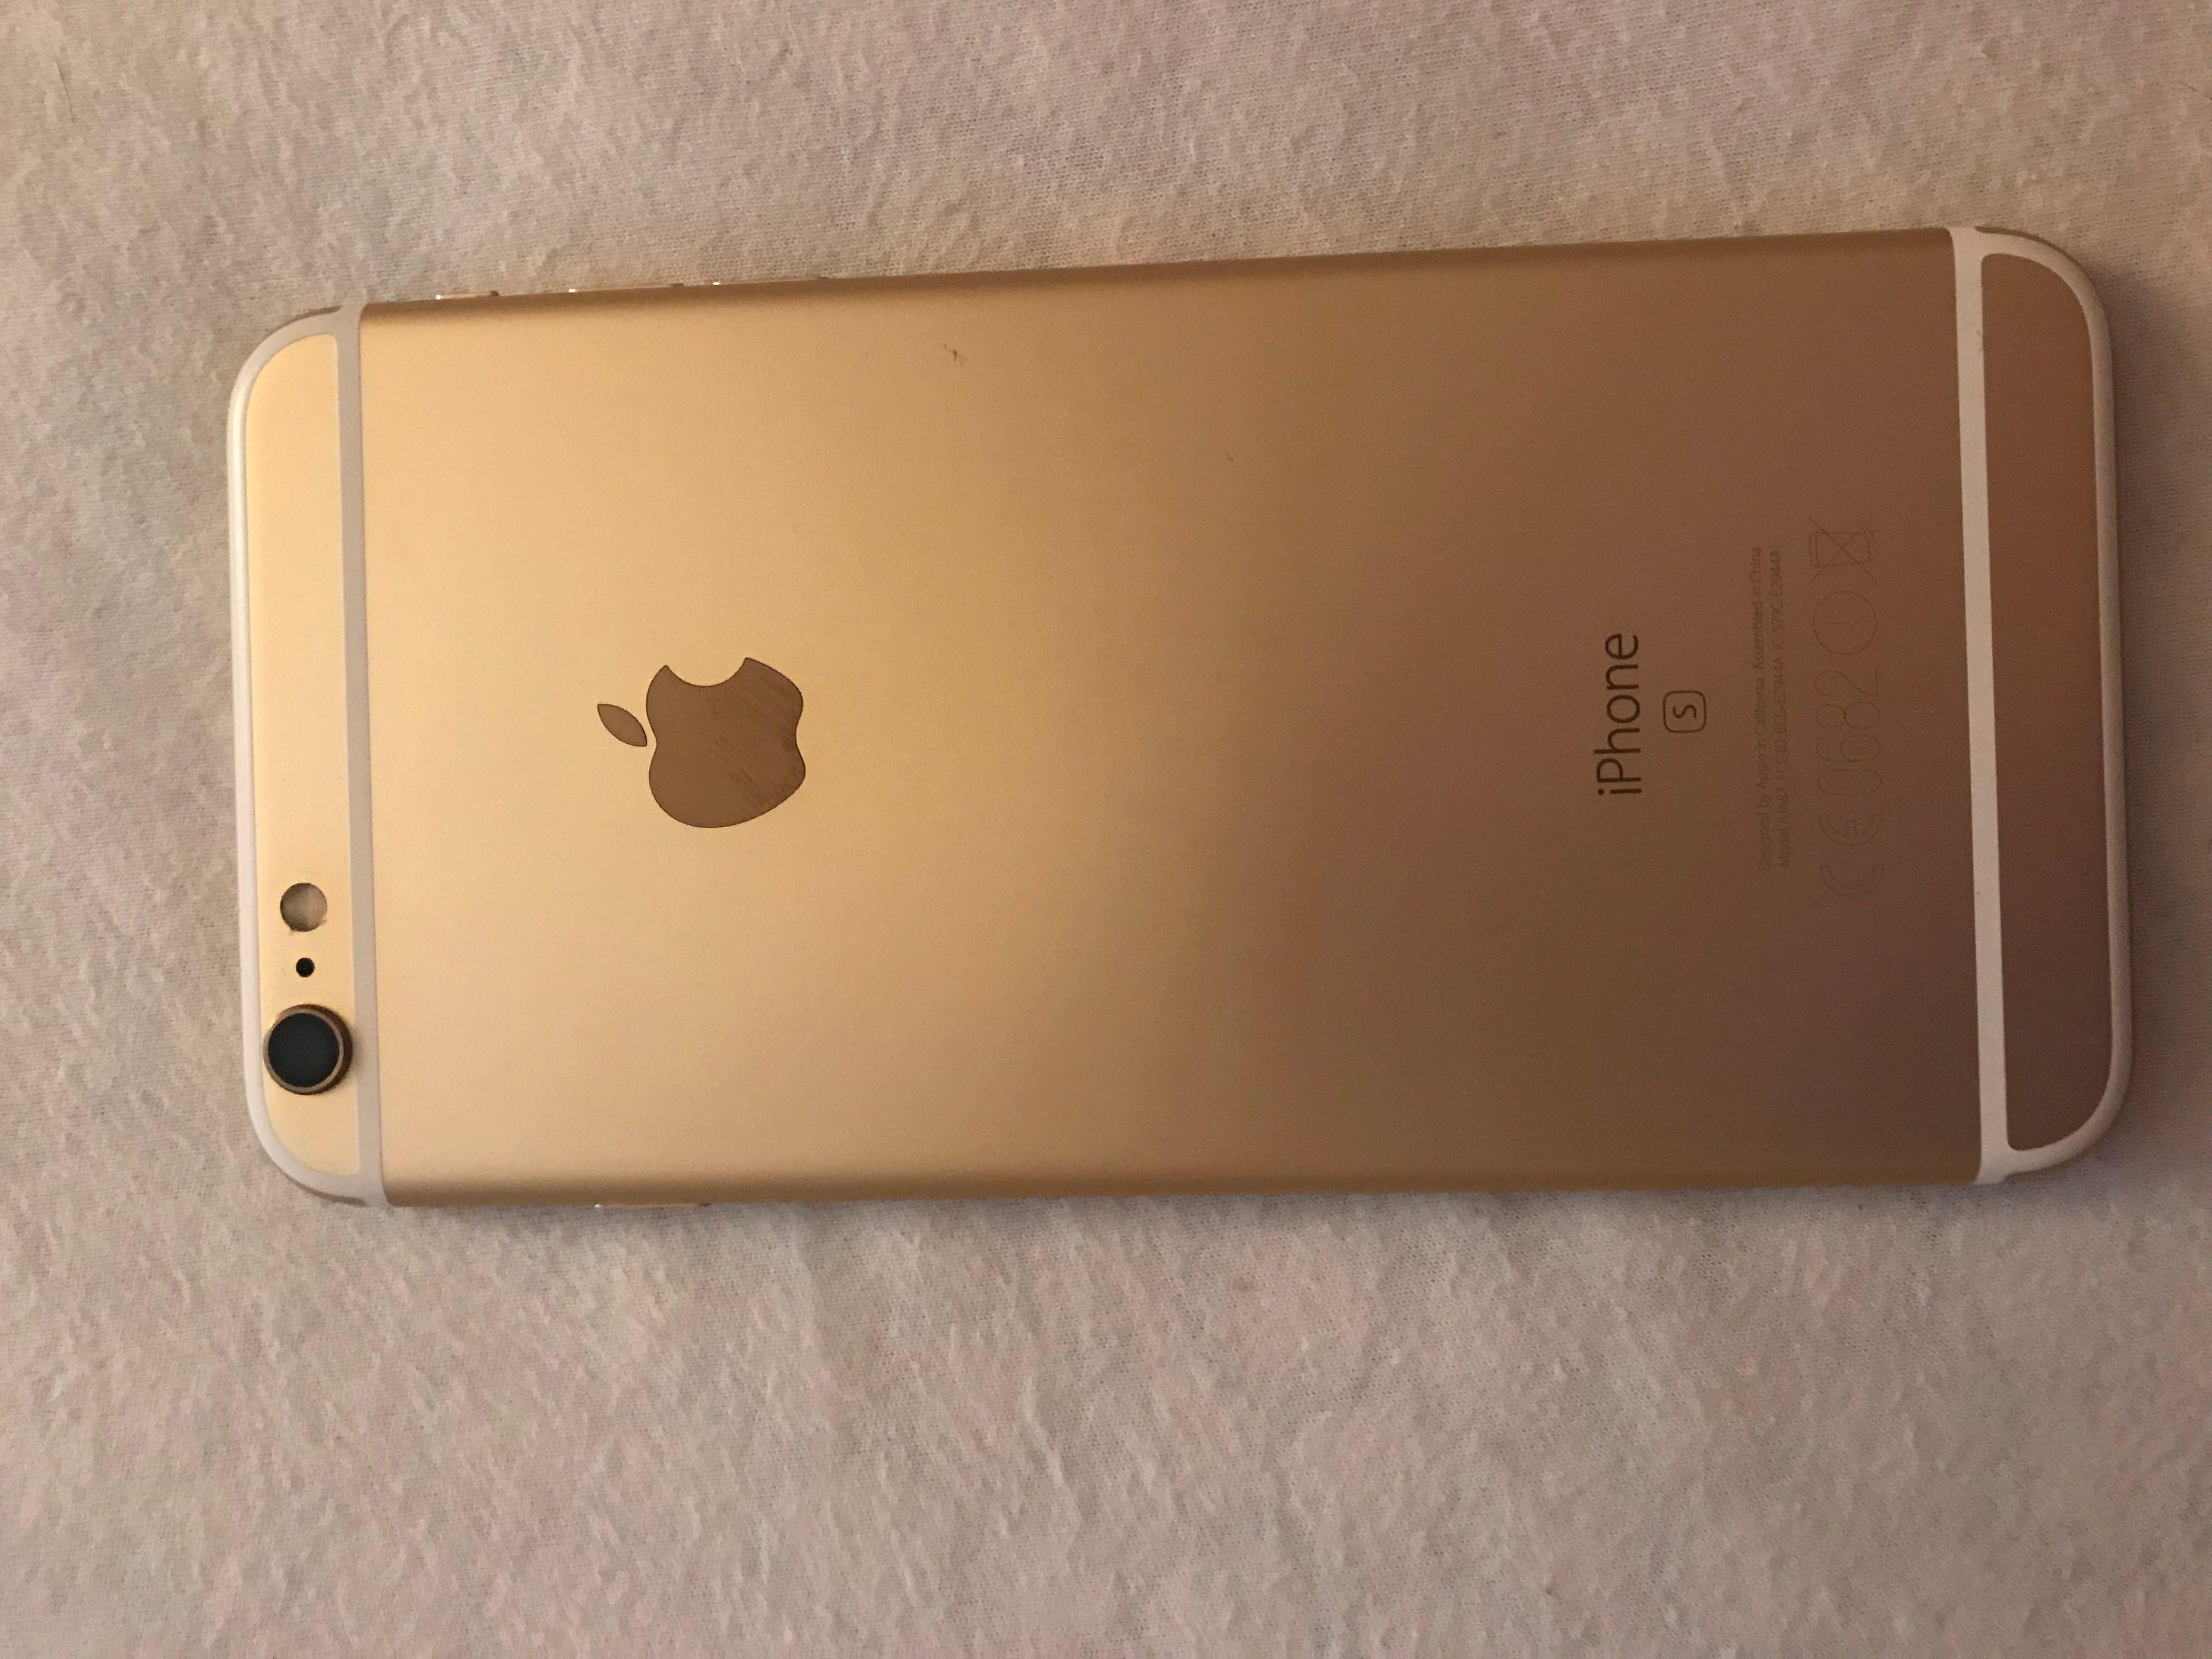 Zobraziť inzerát ~ MacBlog.sk - iPhone - Predám iPhone 6S Plus Gold 16GB 73a513aa33d